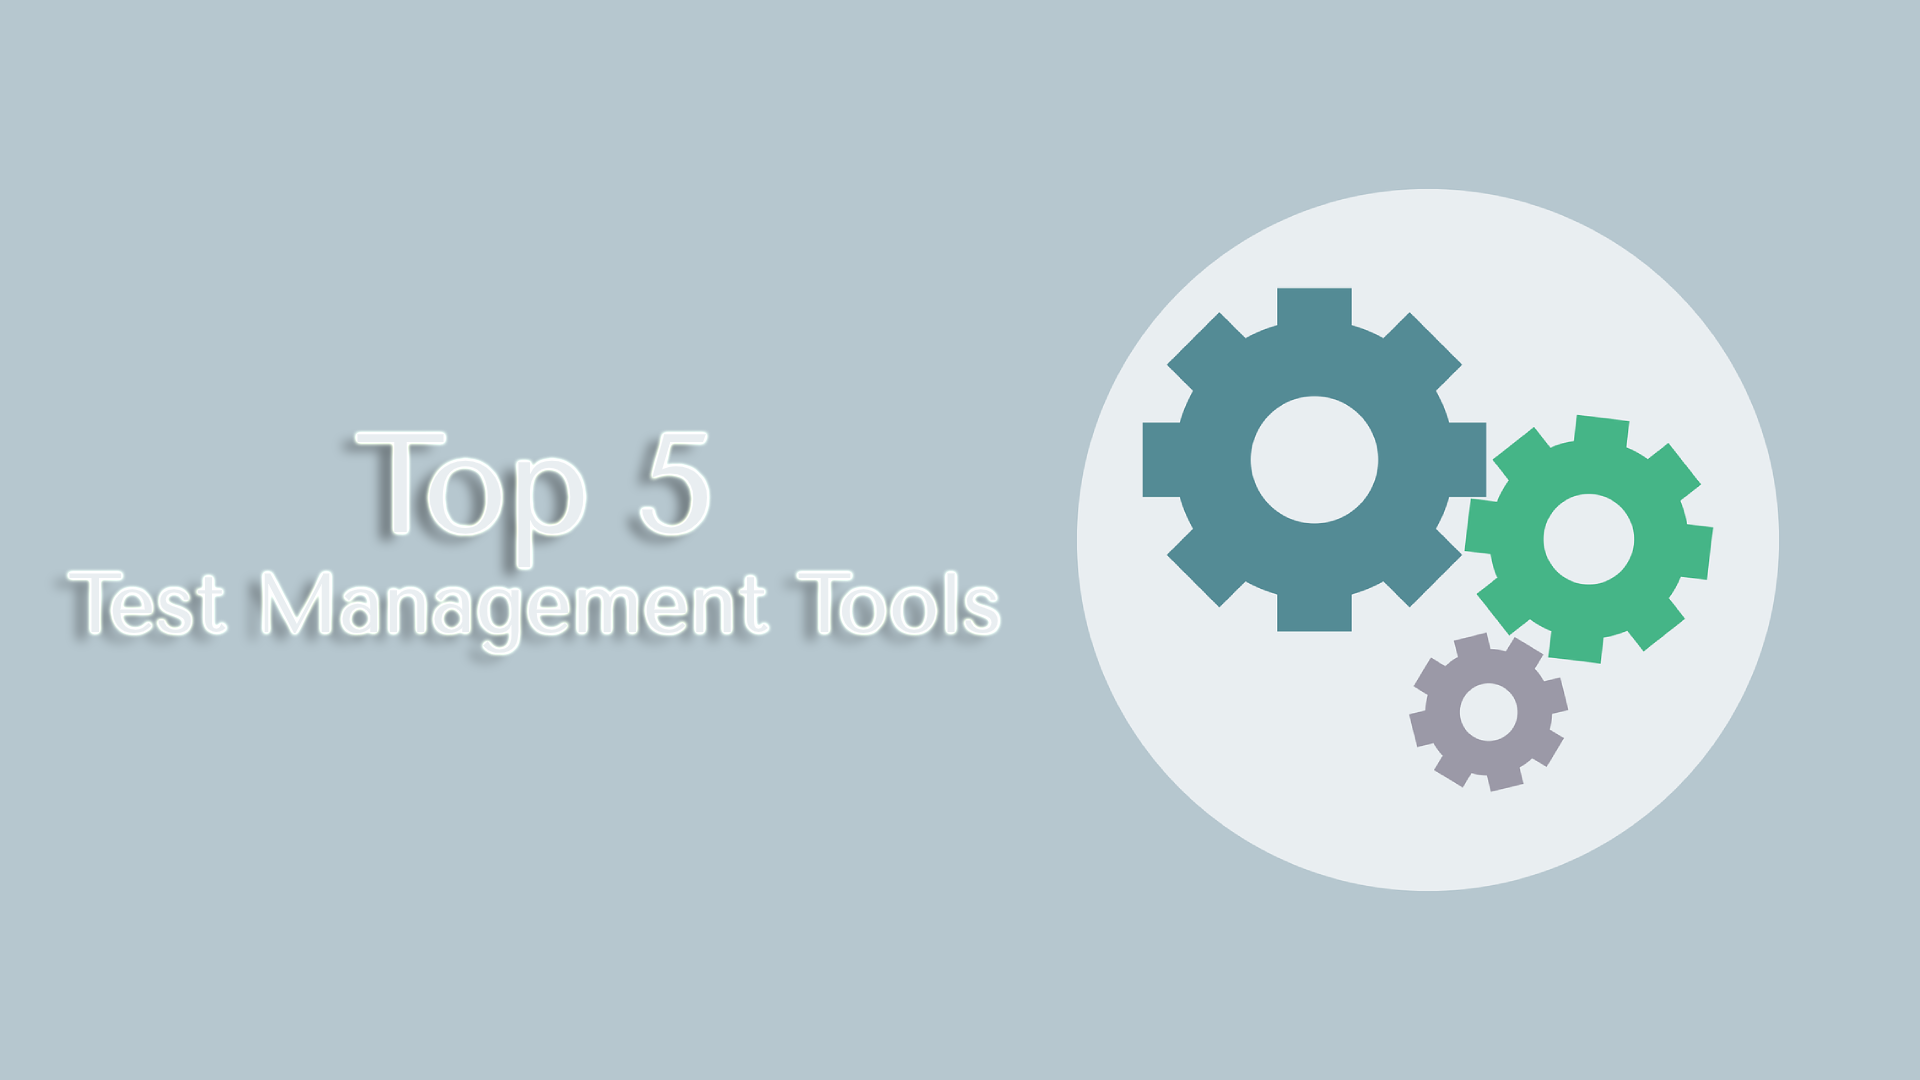 Top 5 Test Management Tools